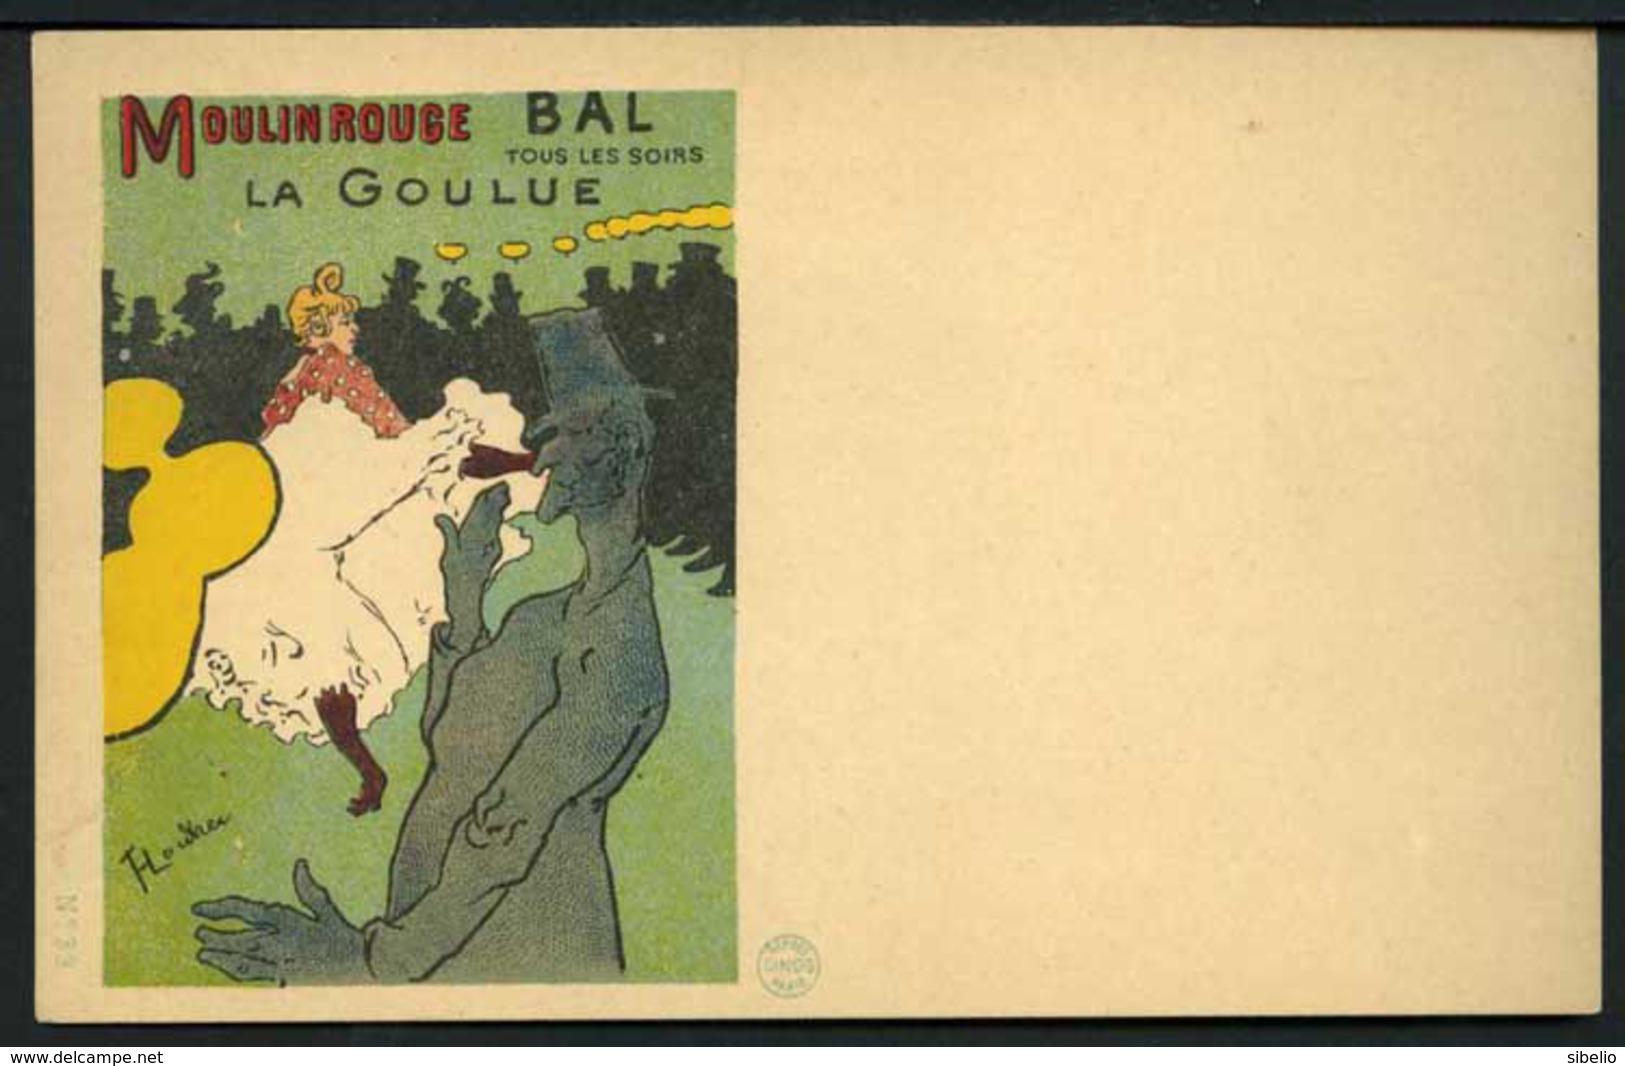 Toulouse Lautrec - Moulin Rouge - La Goulue - CINOS N° 33 - Non Viaggiata 1898/1900 - Rif. 16324 - Altre Illustrazioni